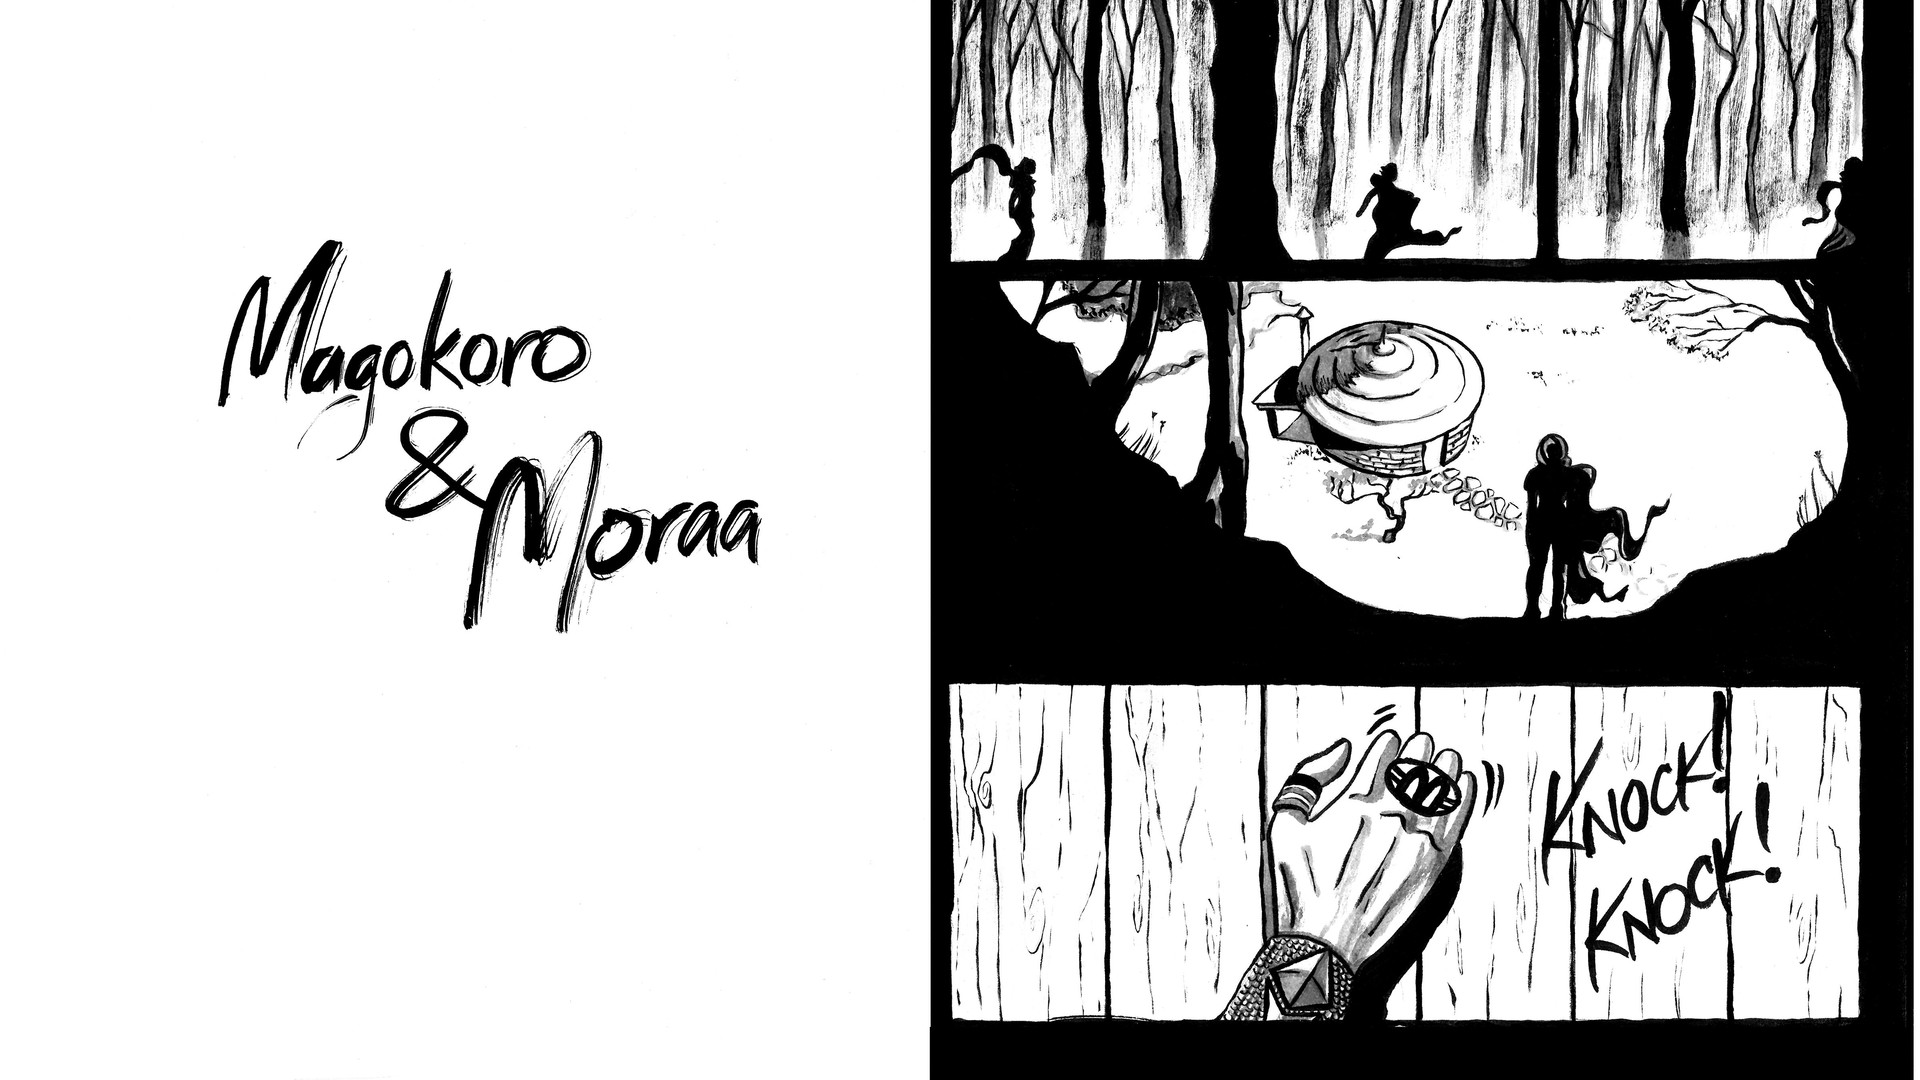 Magokoro & Moraa